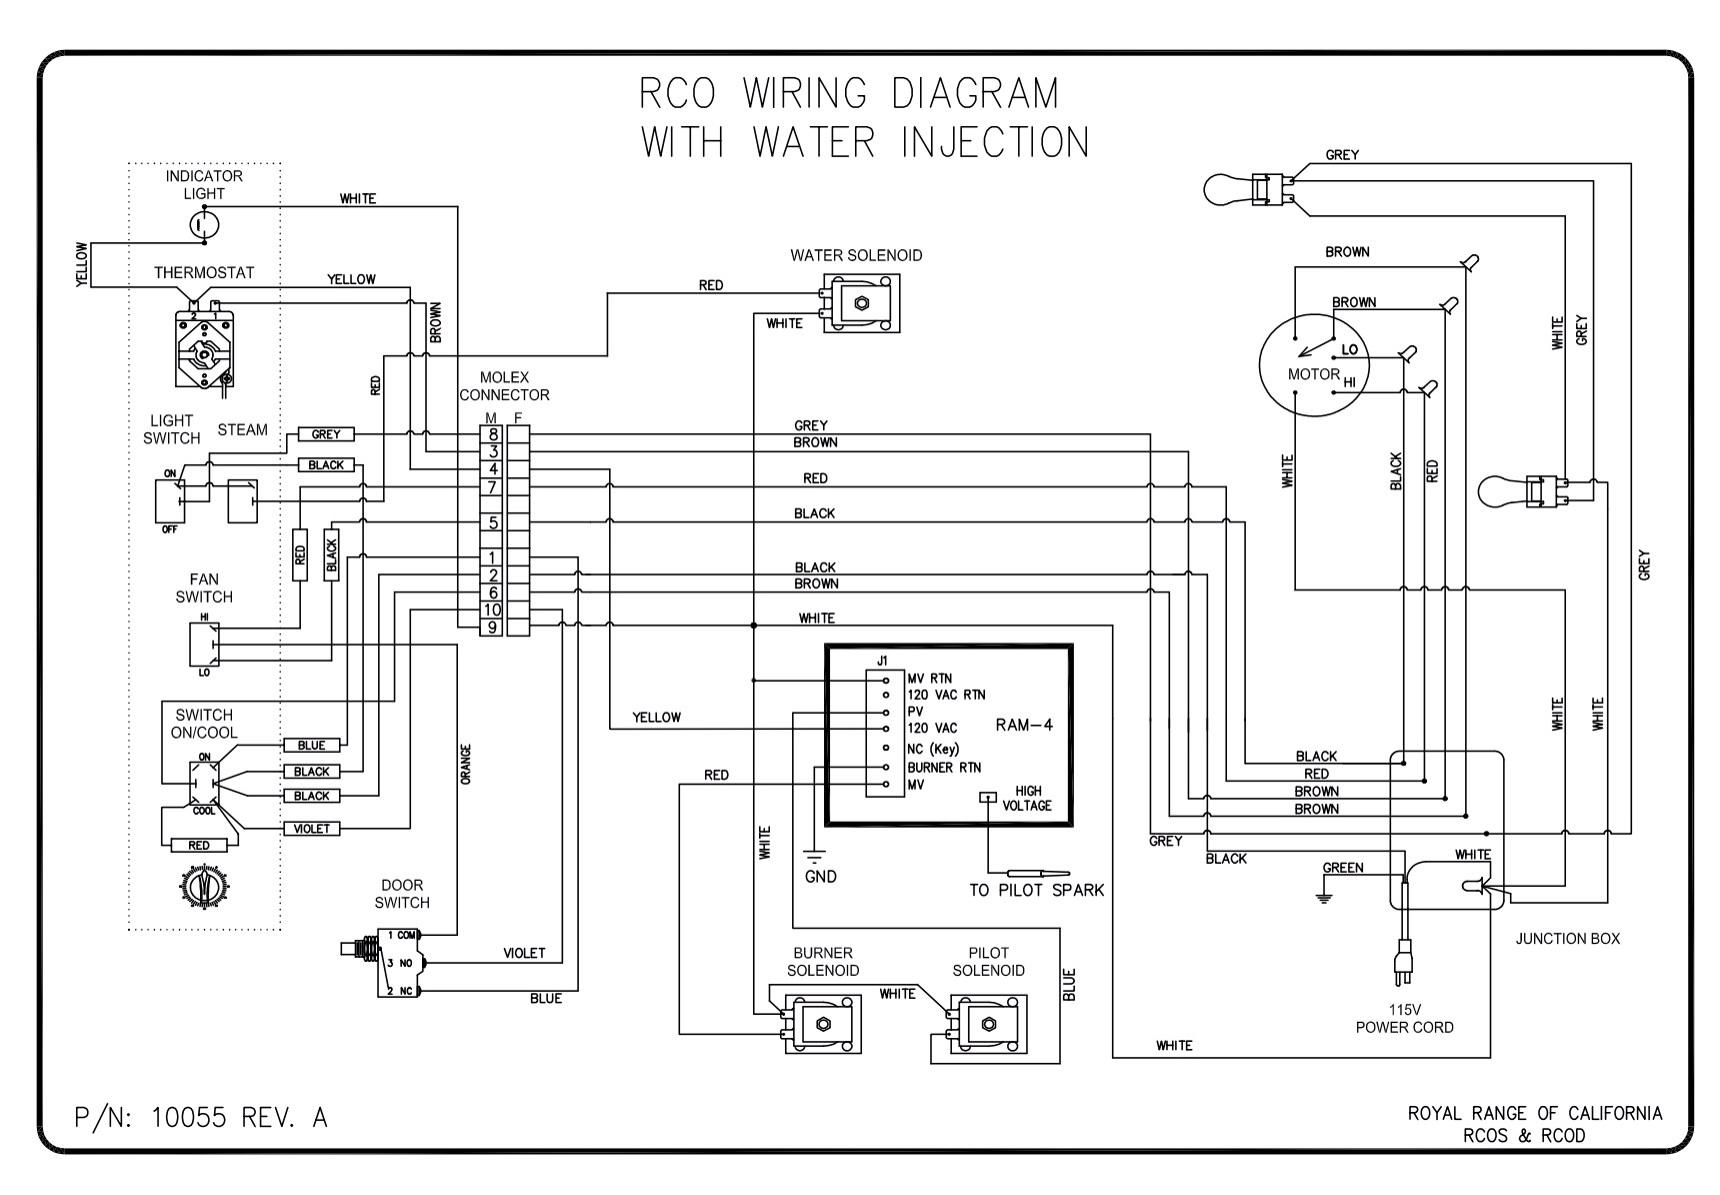 2014 Mercedes Sprinter Fuse Box Diagram Schematic Diagrams 2001 S500 C300 Electrical Wiring 2000